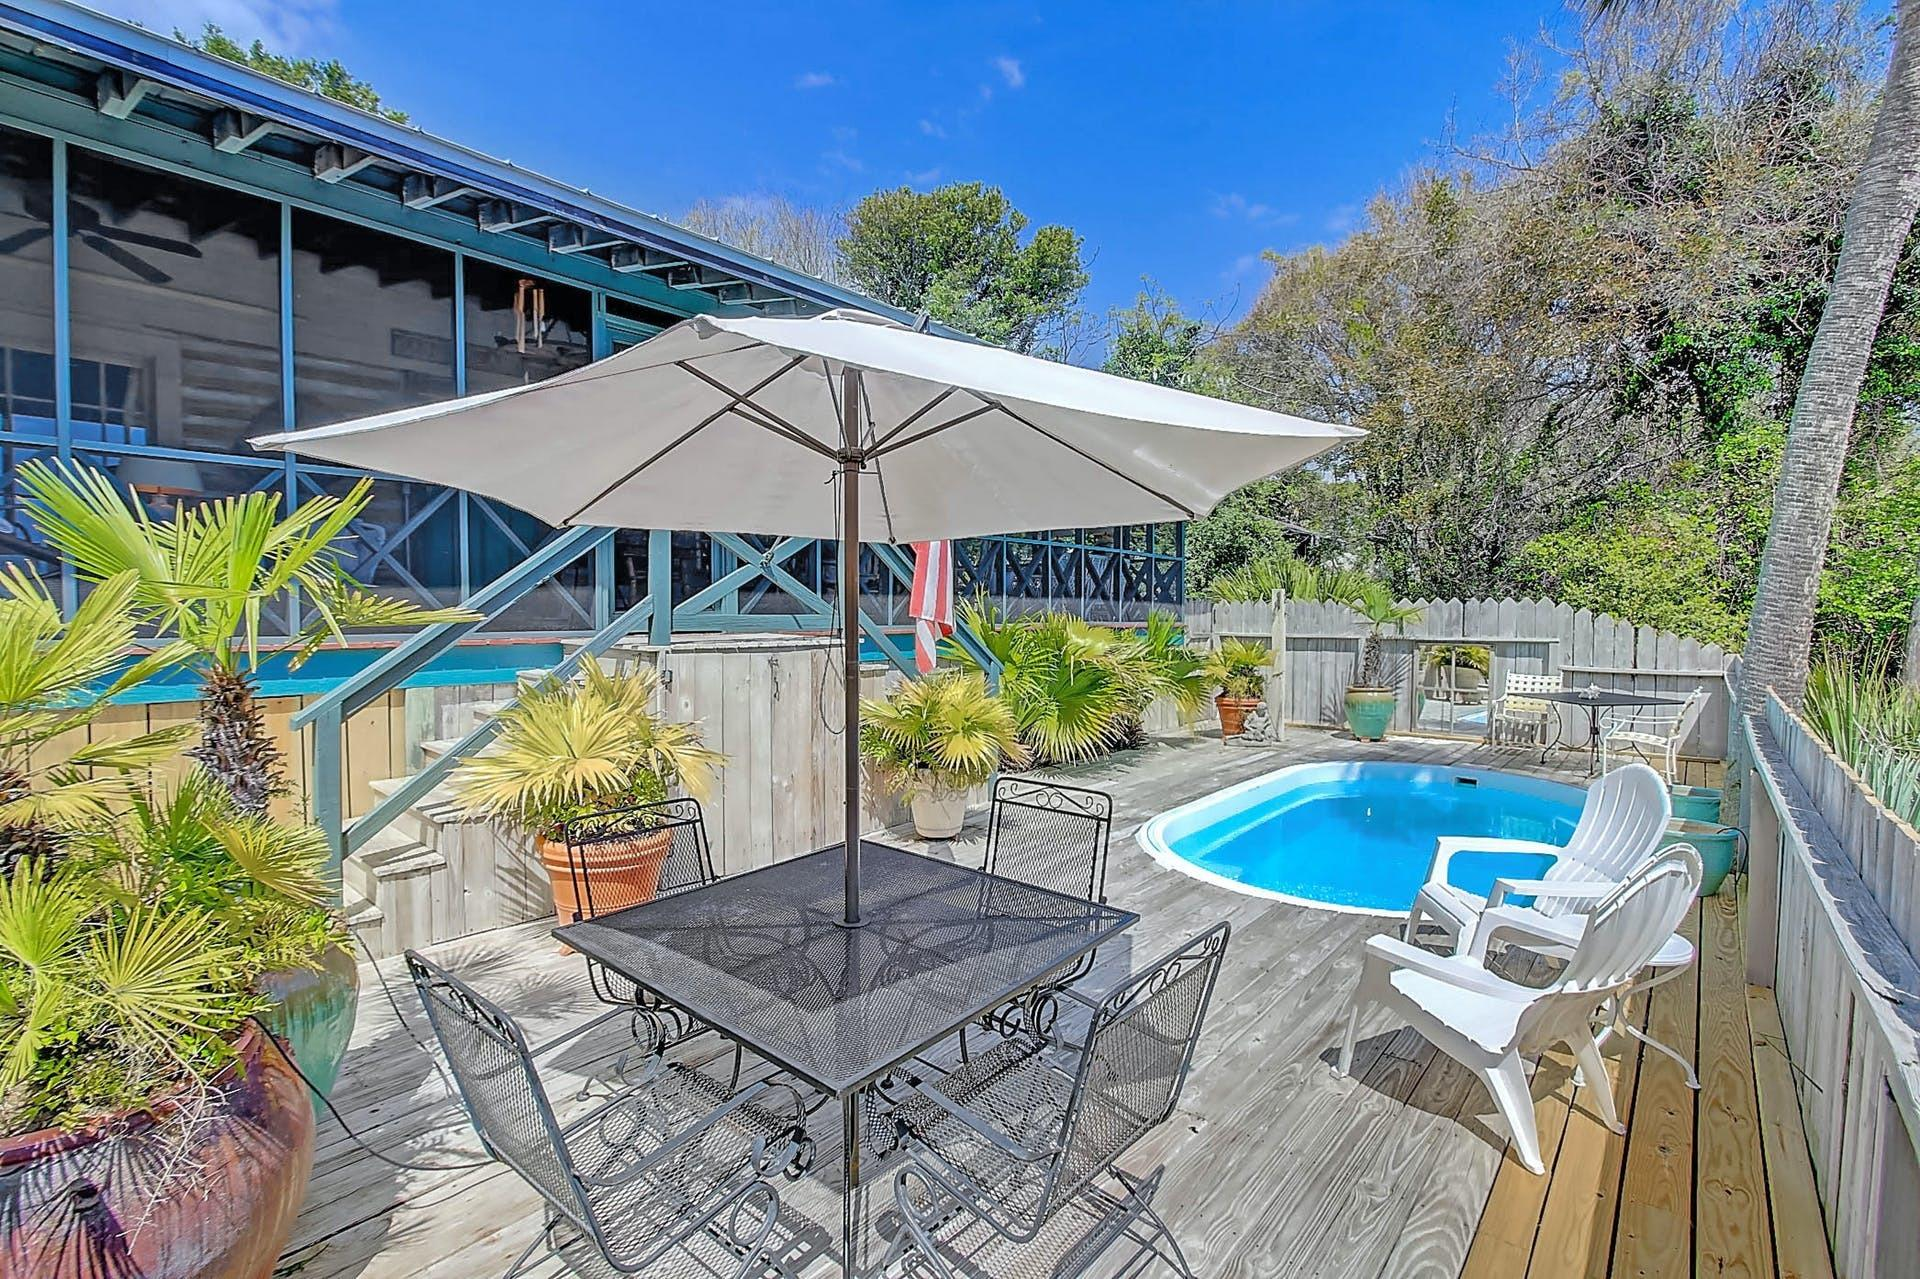 Folly Beach Homes For Sale - 306 Cooper, Folly Beach, SC - 39